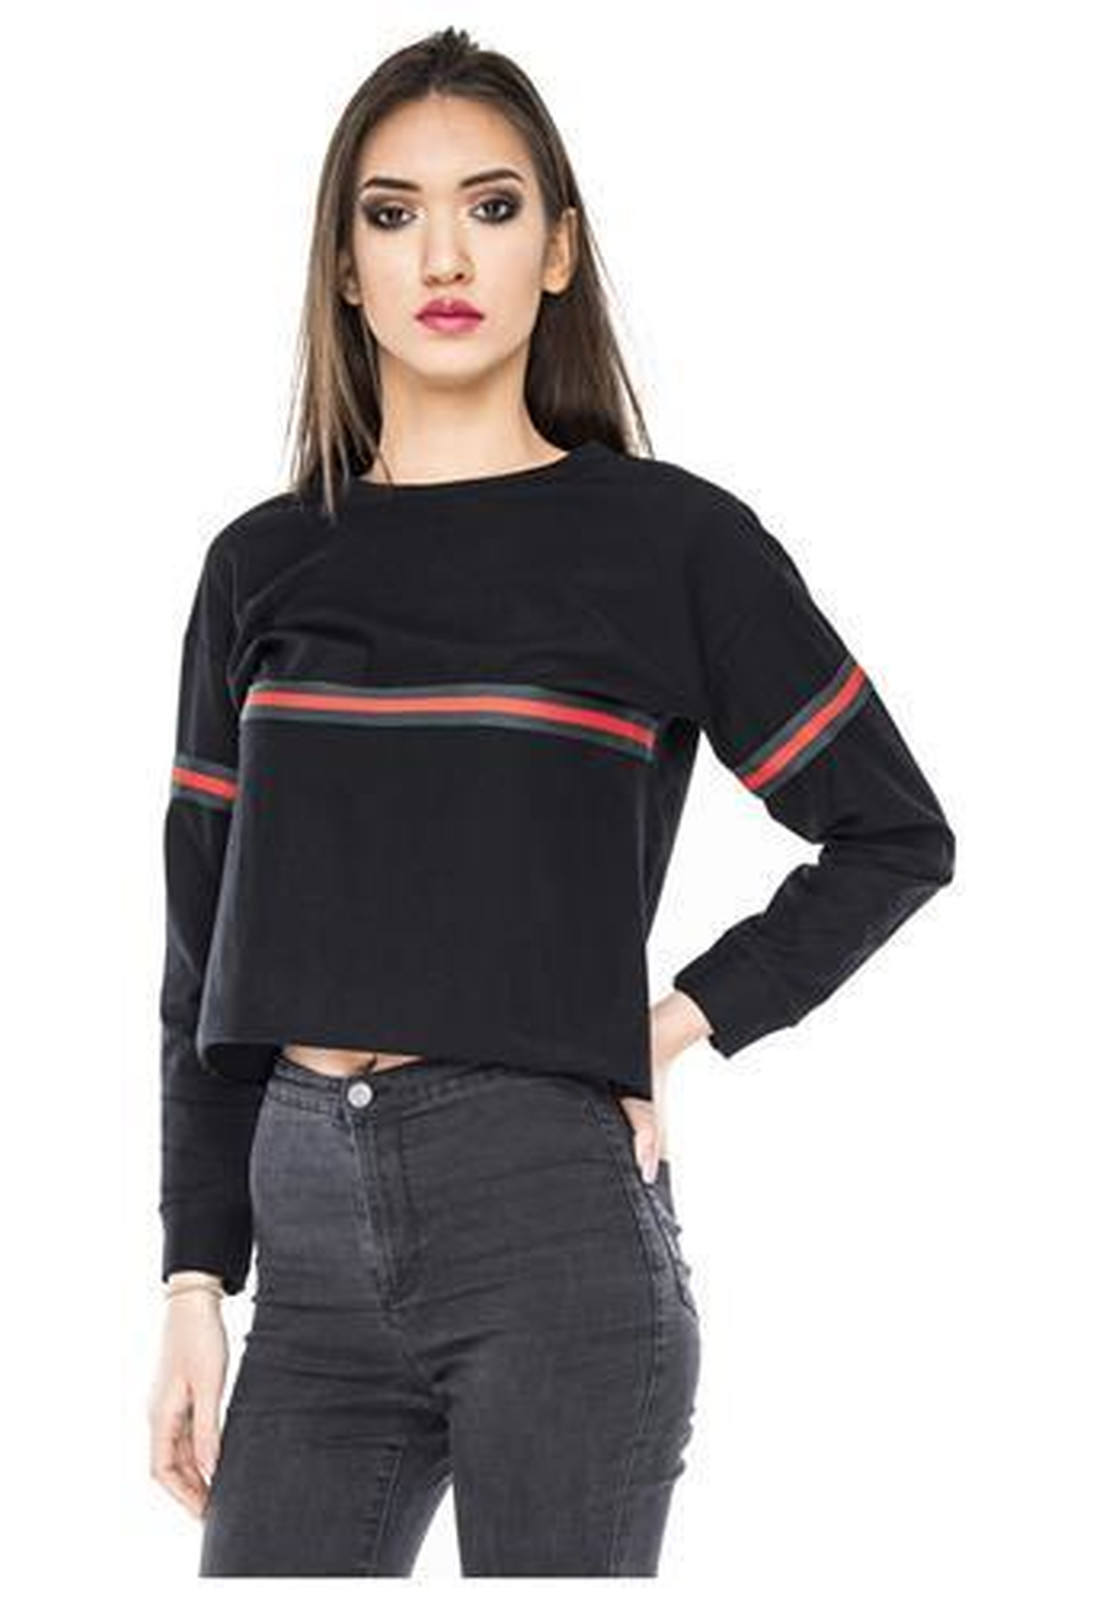 9d2115aaa57d Crop Sweater Cropped Top Damen Stripes Sweatshirt bauchfrei Streifen  Oberteil Logo. Loomiloo